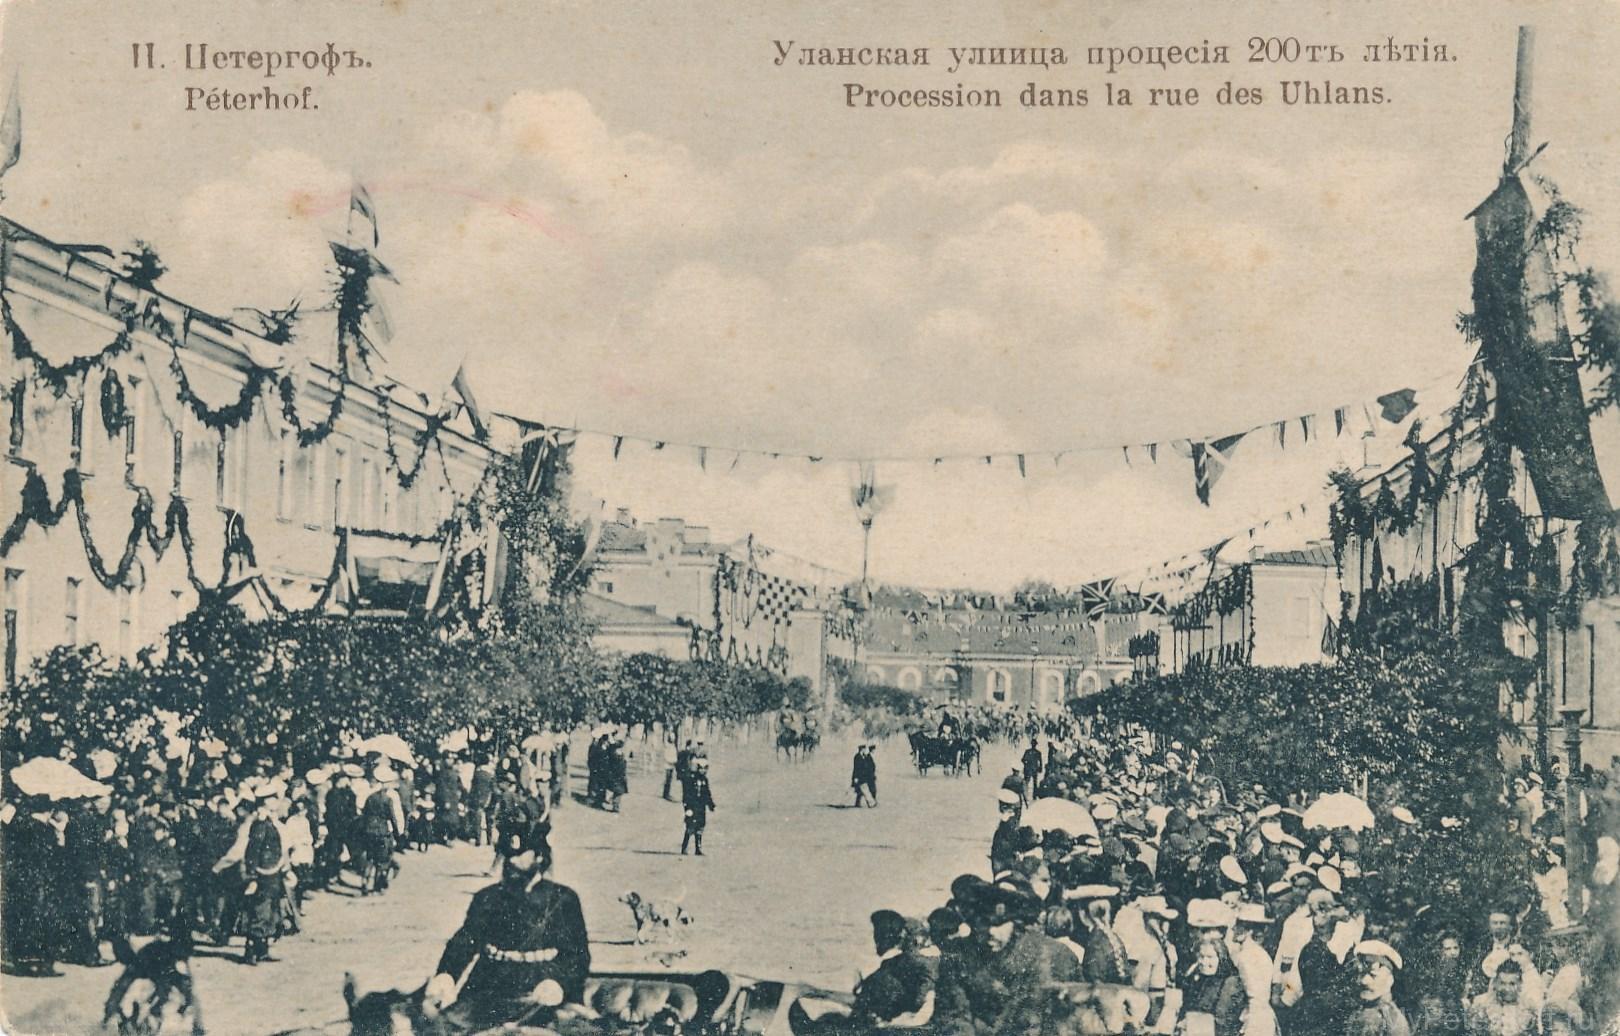 Уланская улица. Процессия 200-летия